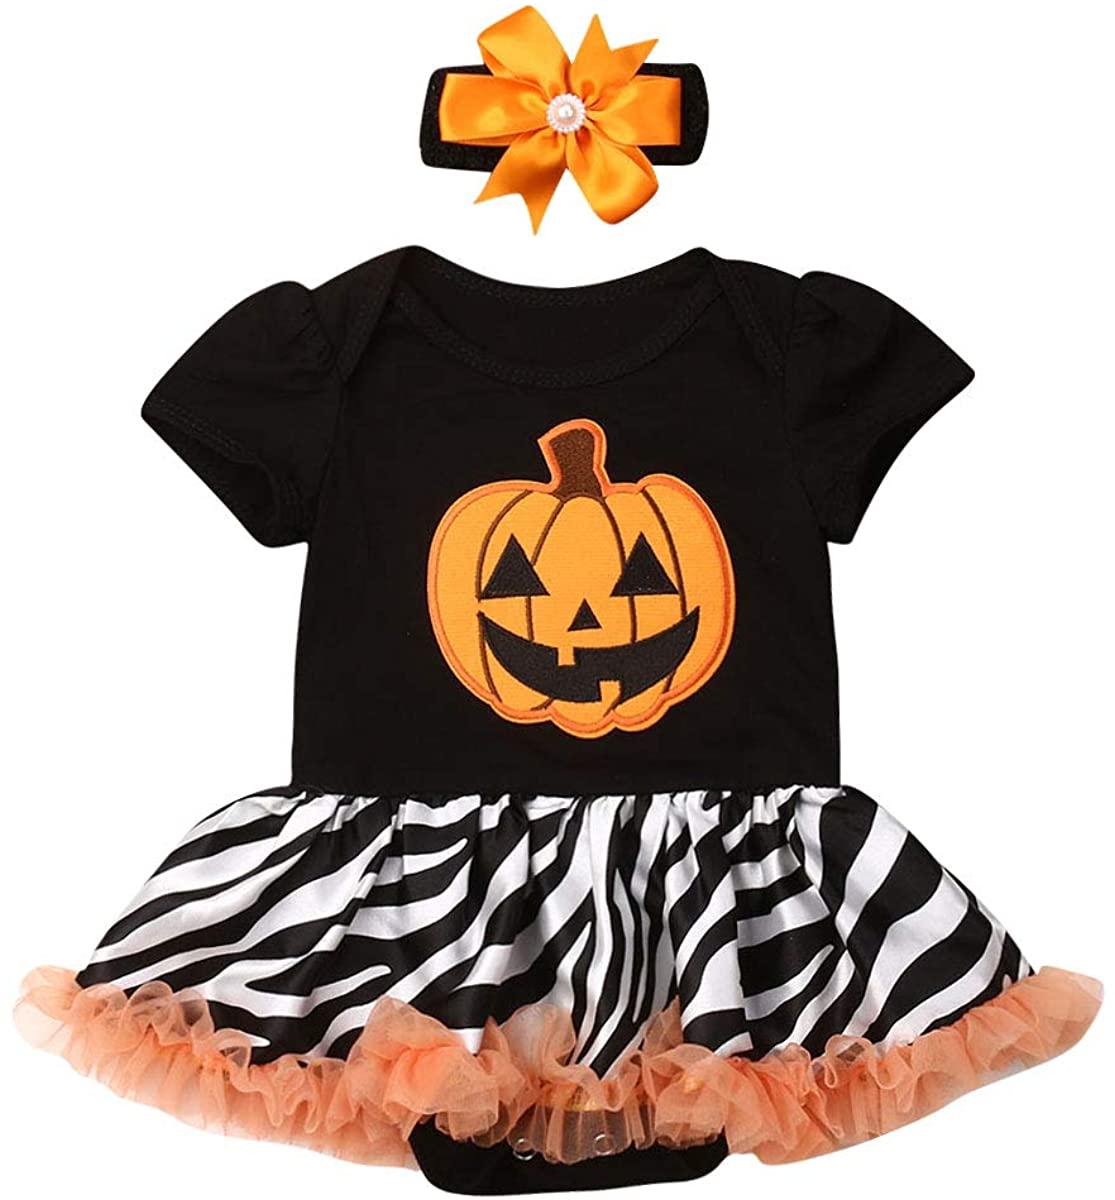 Baby Girl Halloween Costumes Skull Short Sleeve Shirt Top Pumpkin Tutu Skirt Bowknot Dress Toddler Kid Outfits Clothing